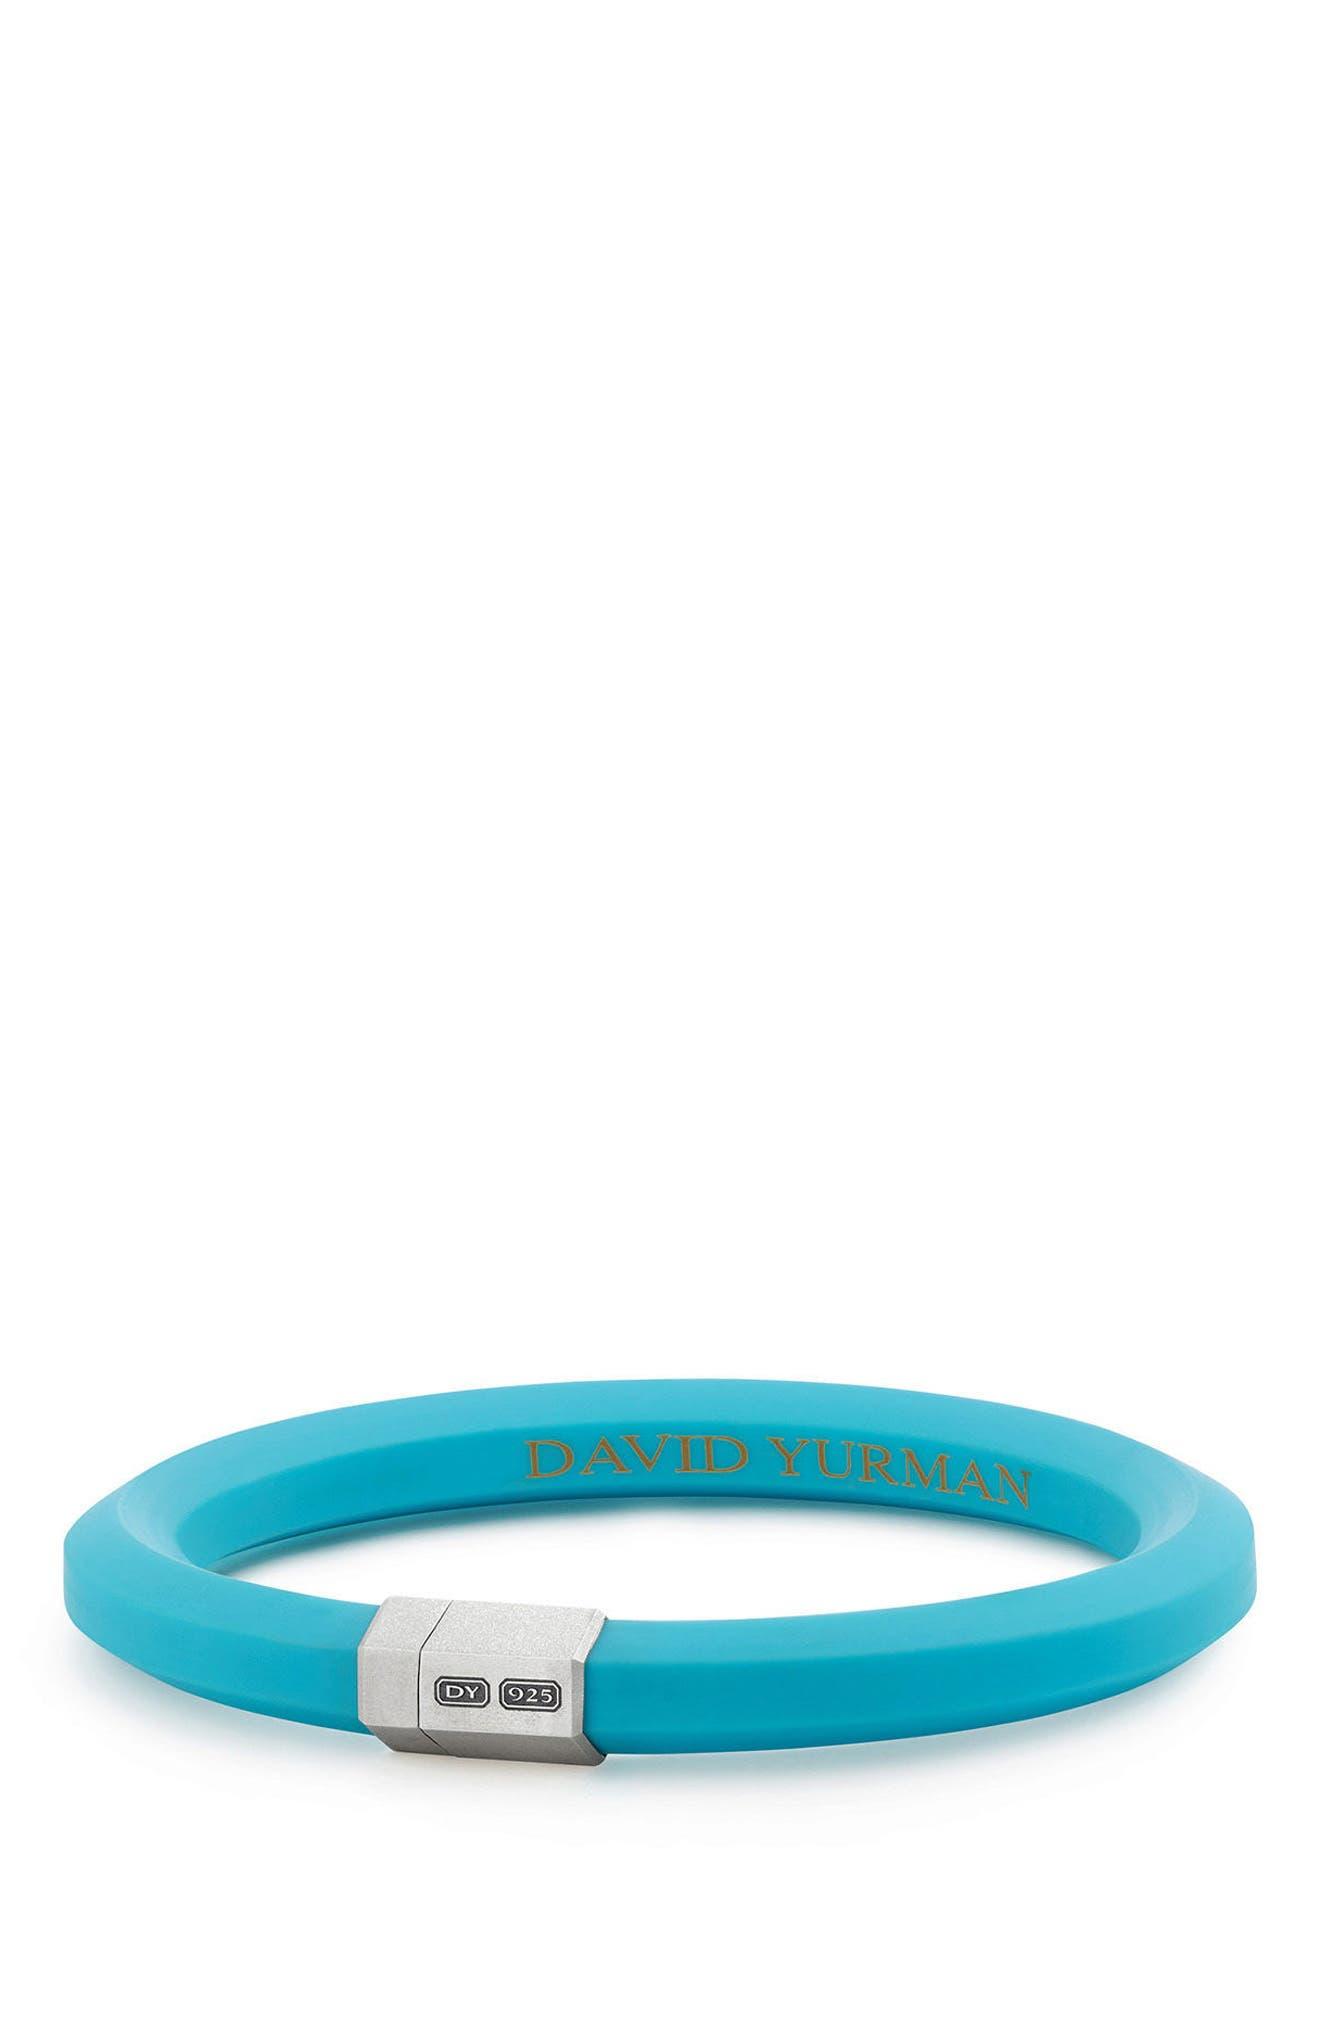 David Yurman 10.5mm Hex Bracelet